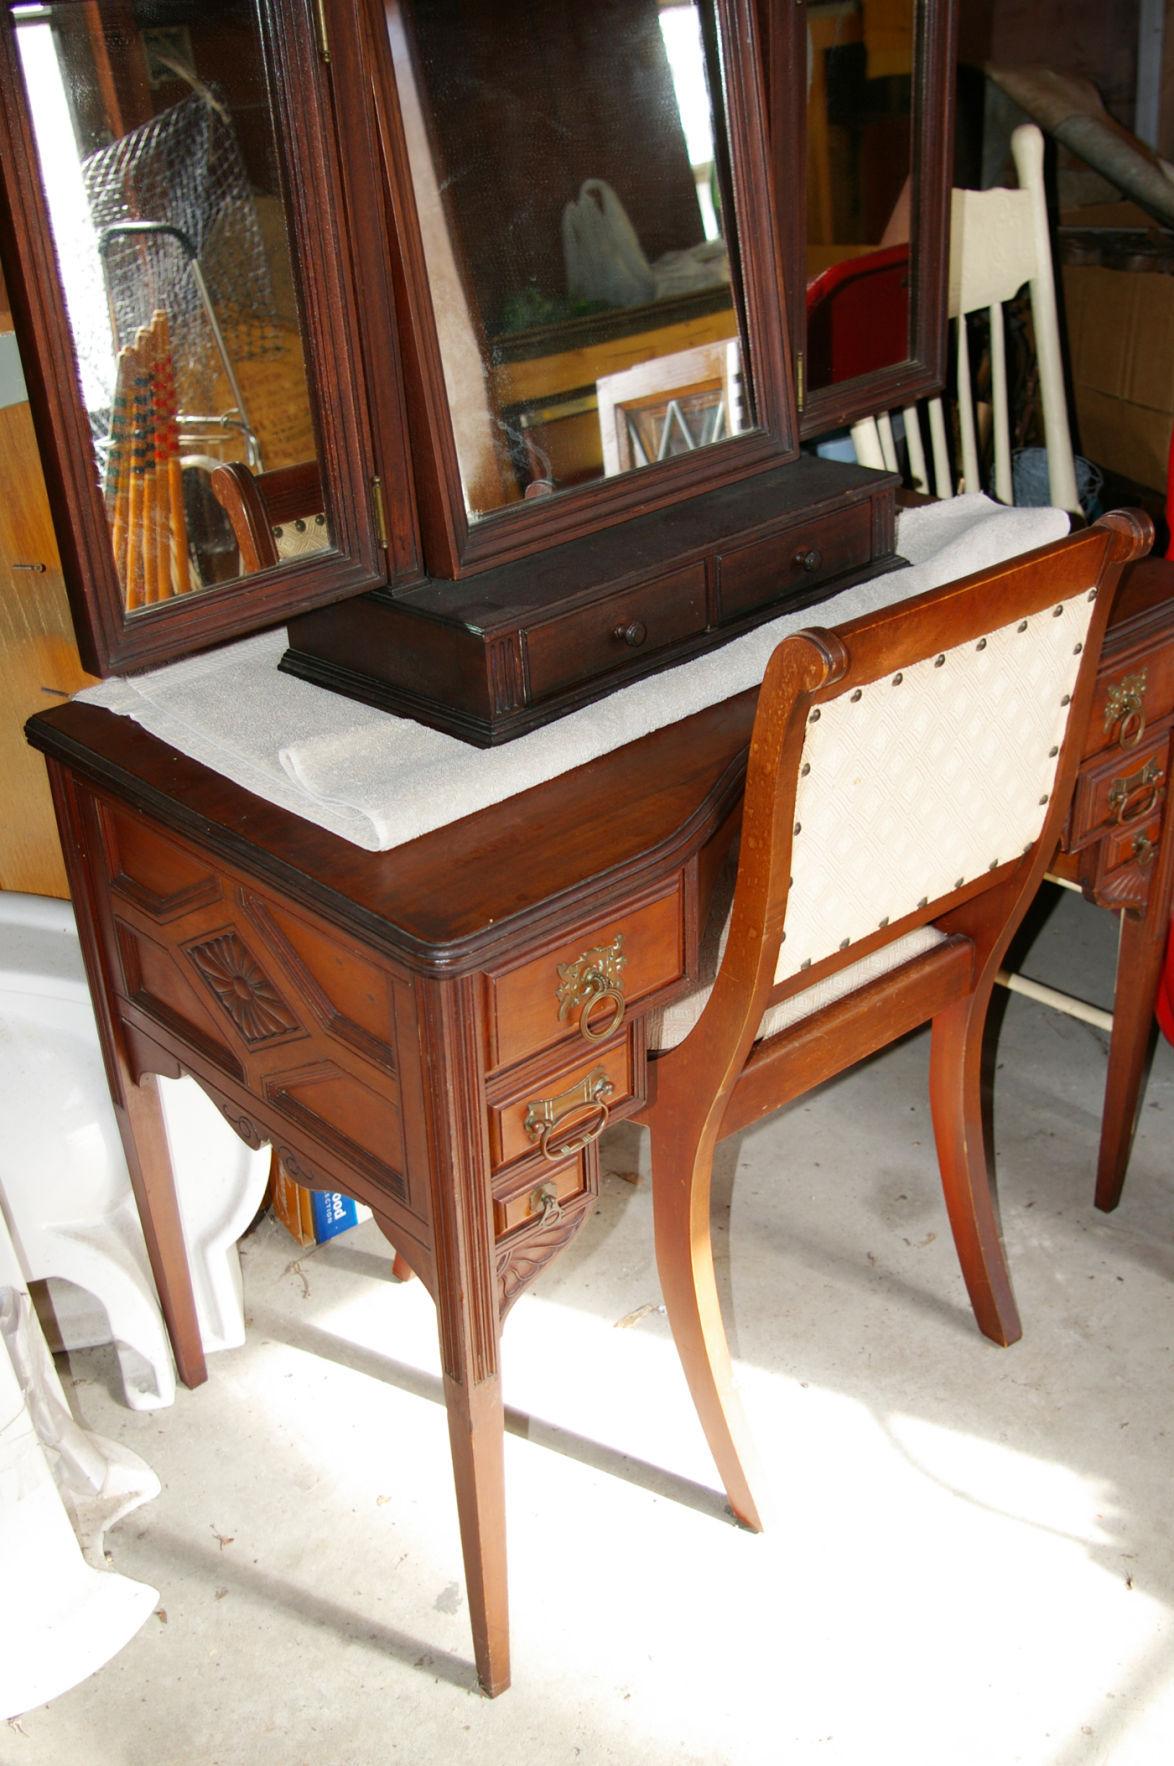 Antique furniture definition antique furniture for Furniture definition